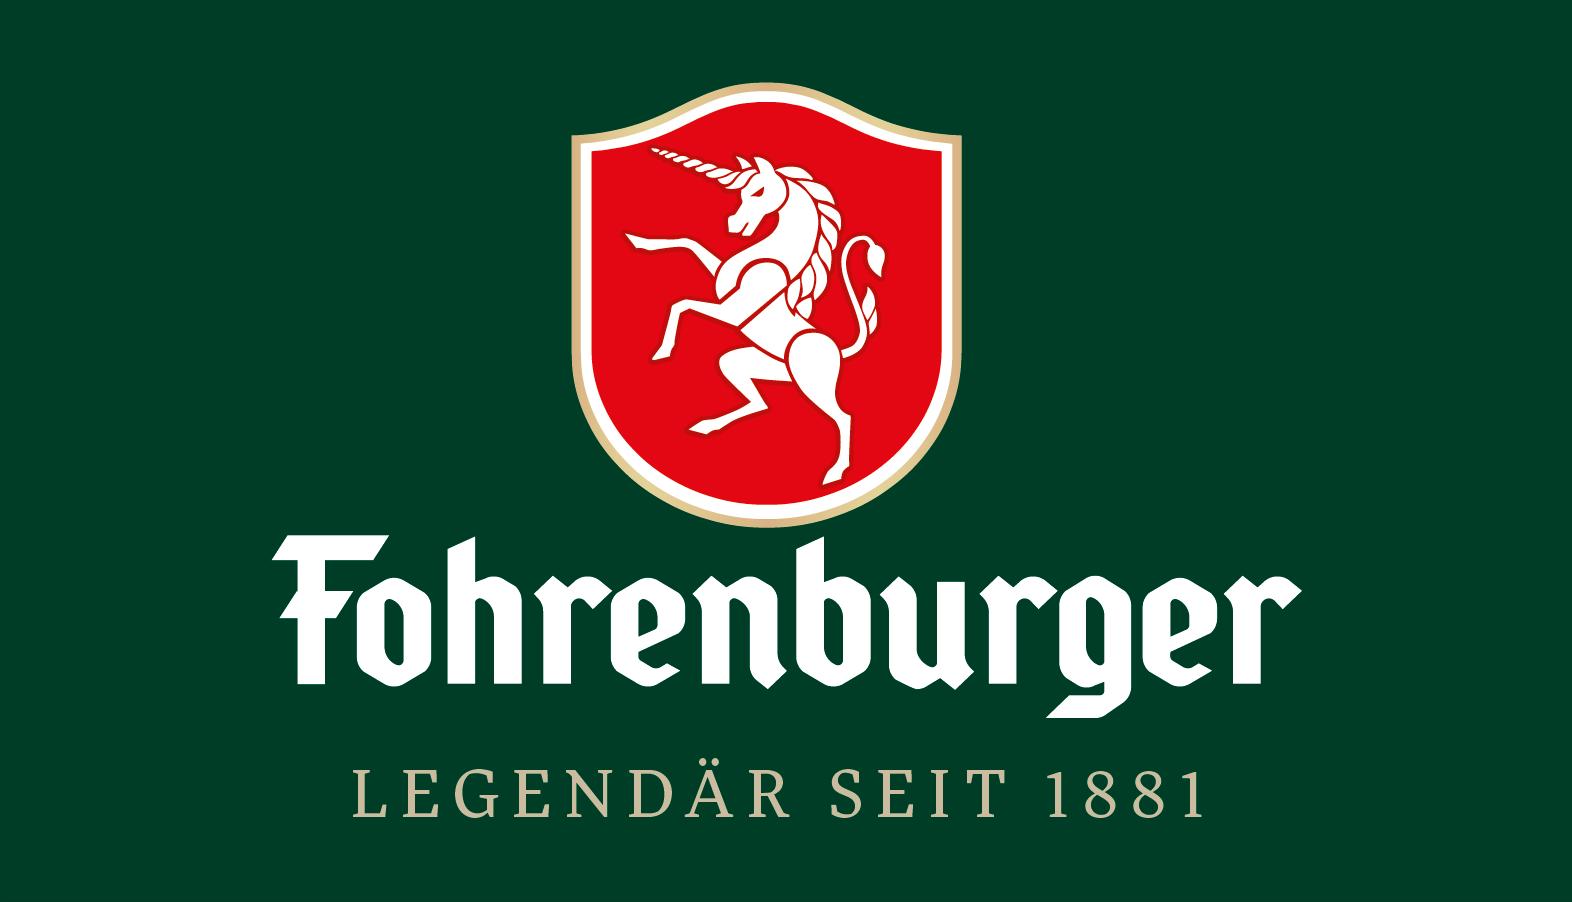 Fohrenburgeer